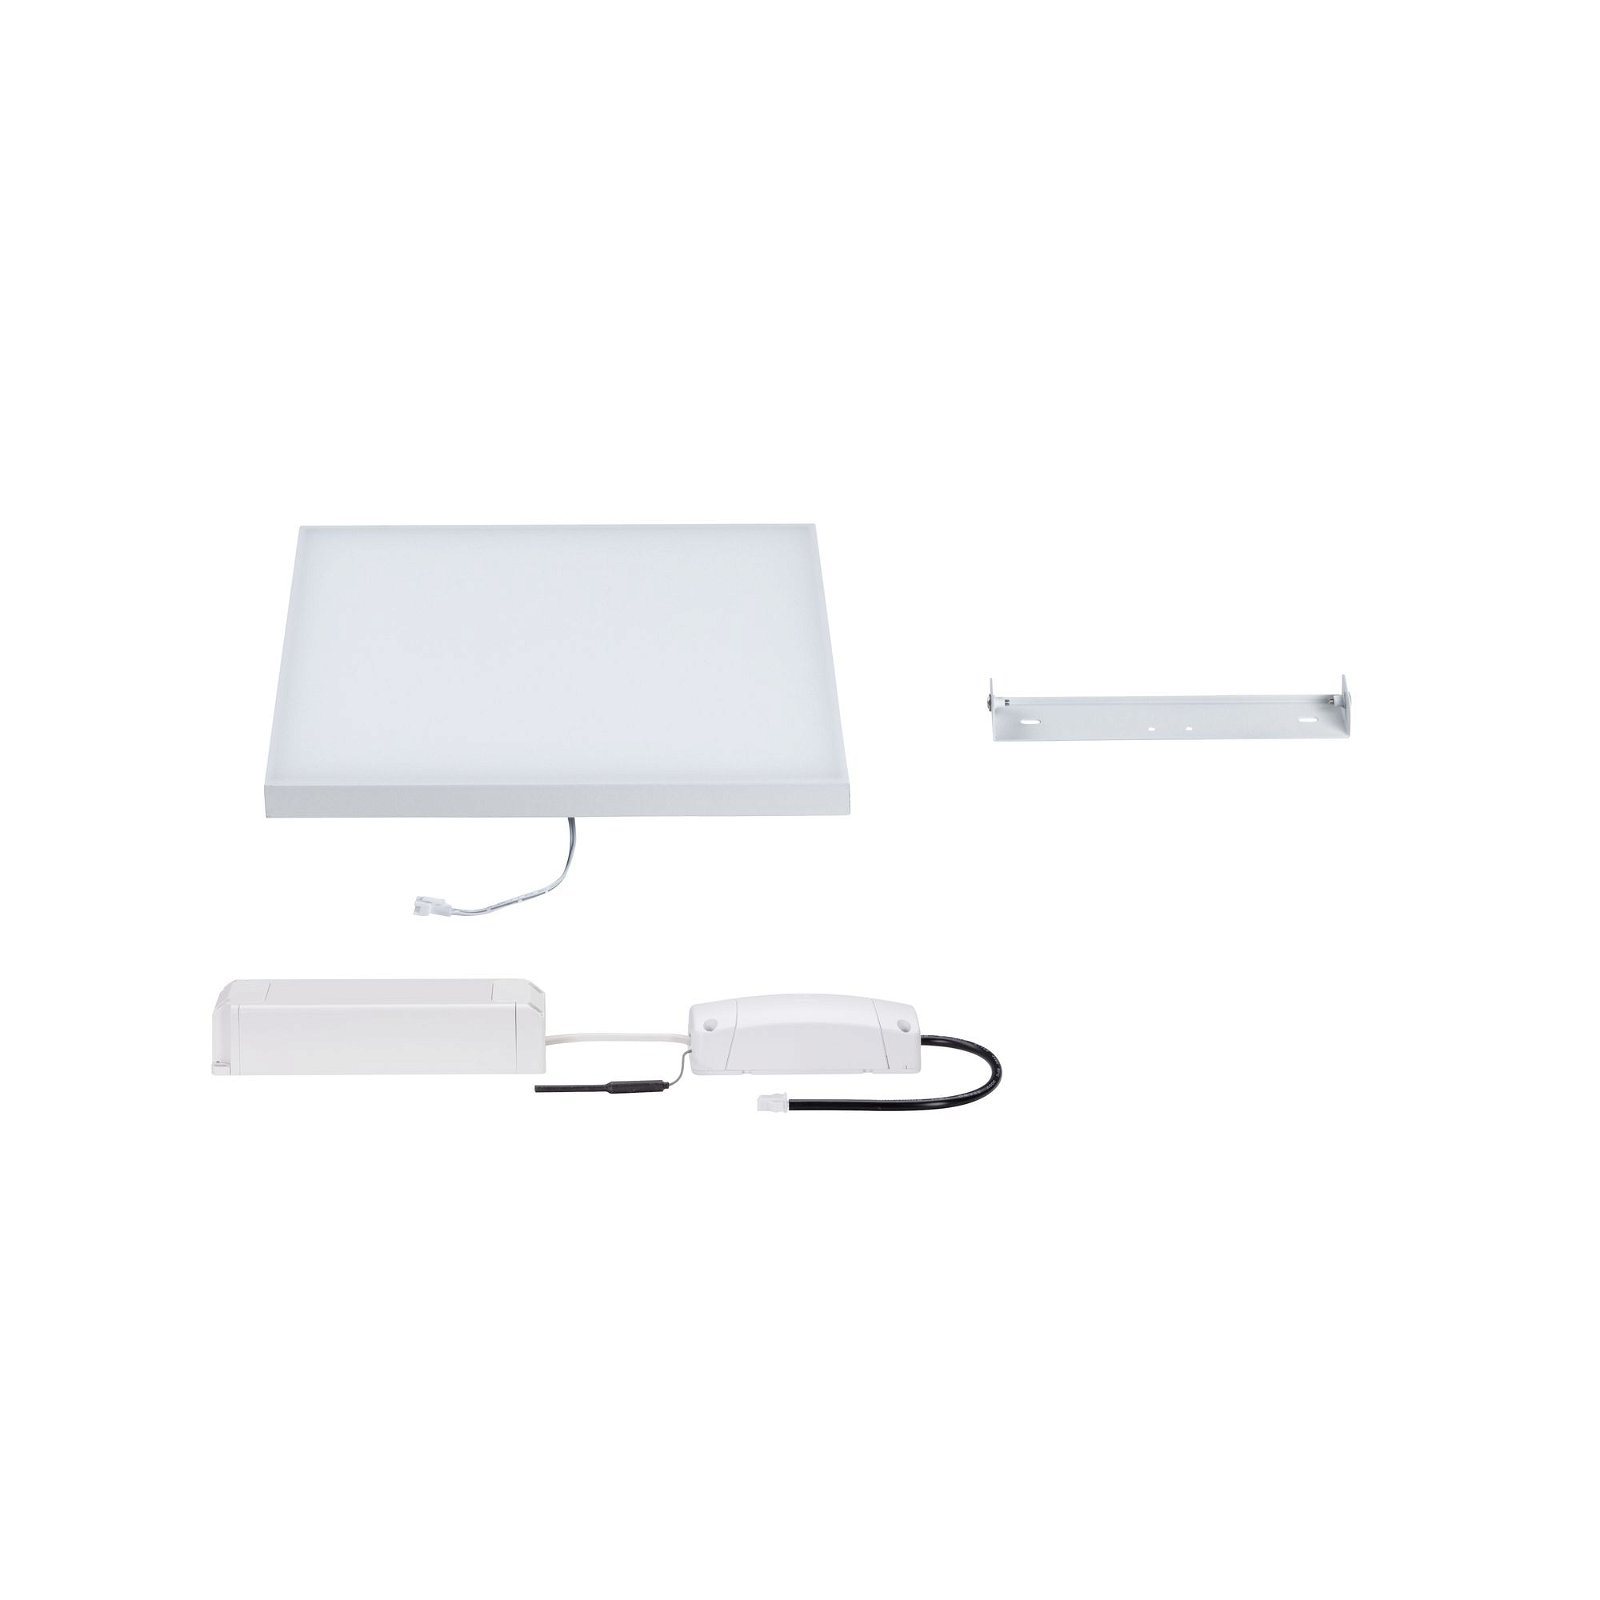 LED Panel Smart Home Zigbee Velora eckig 295x295mm Tunable White Weiß matt